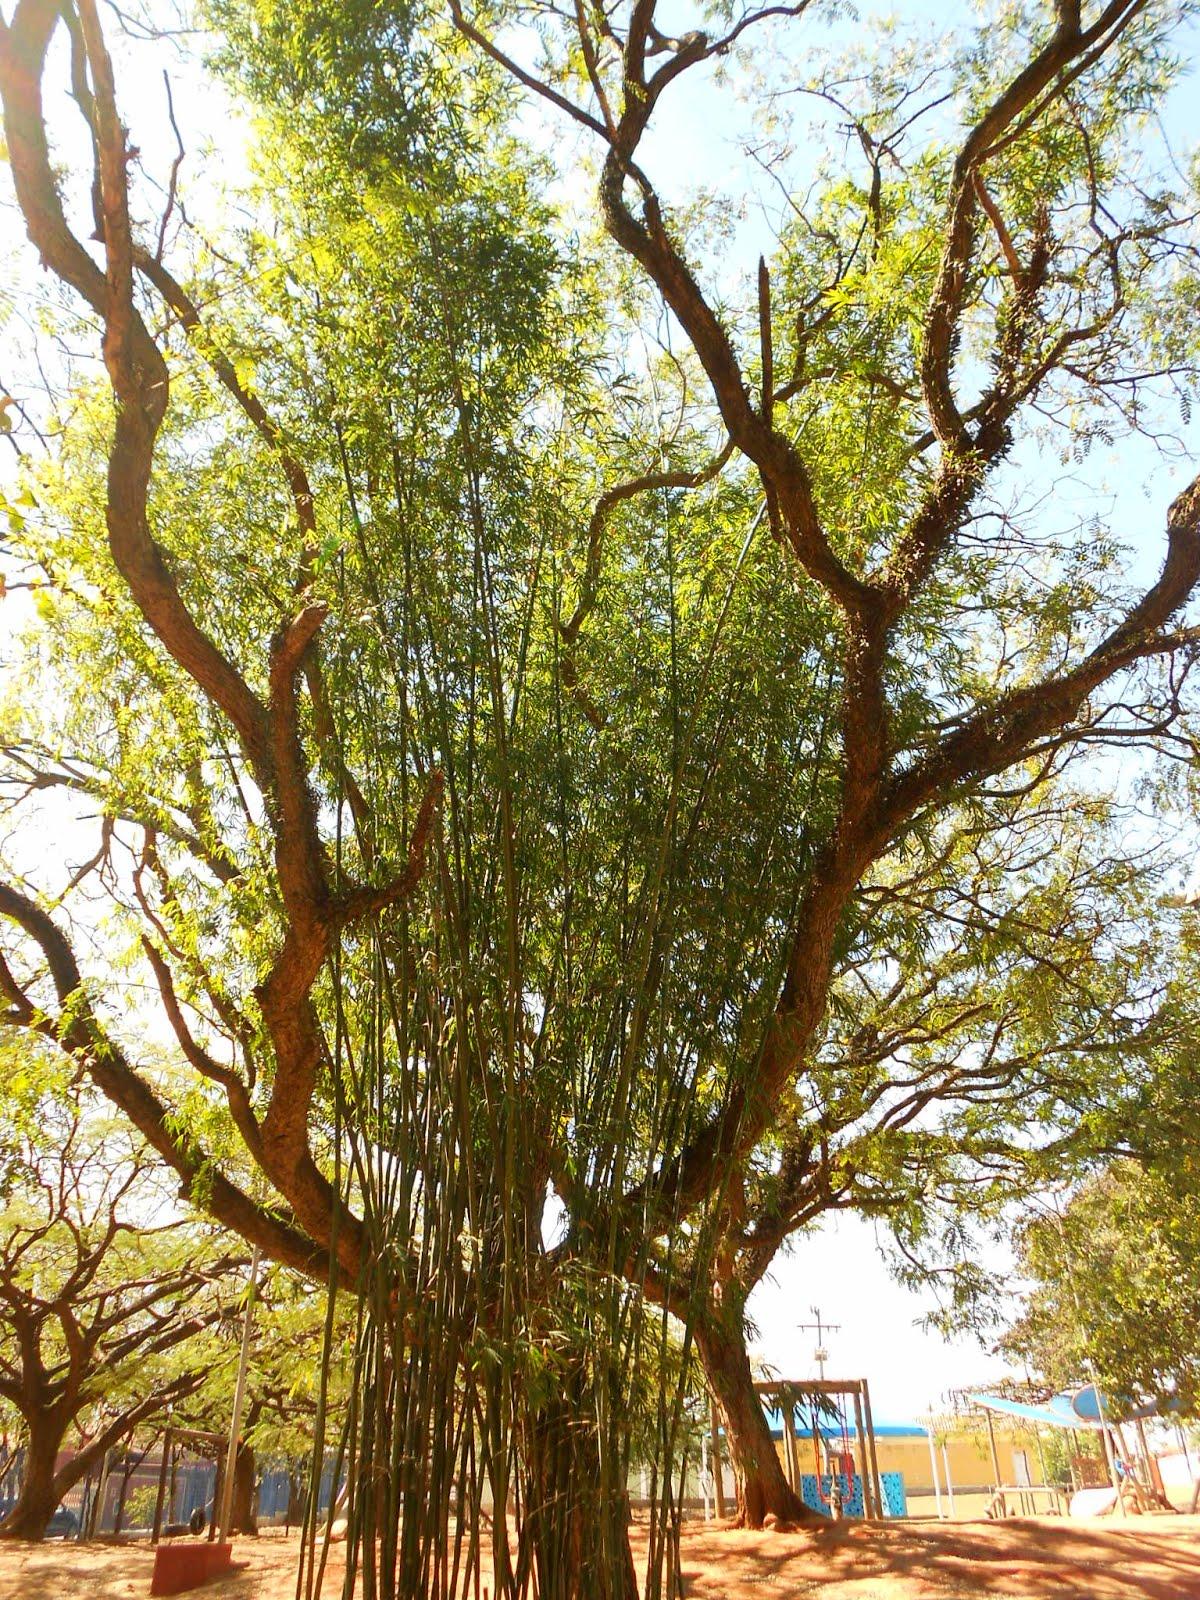 Pequeno bambuzal